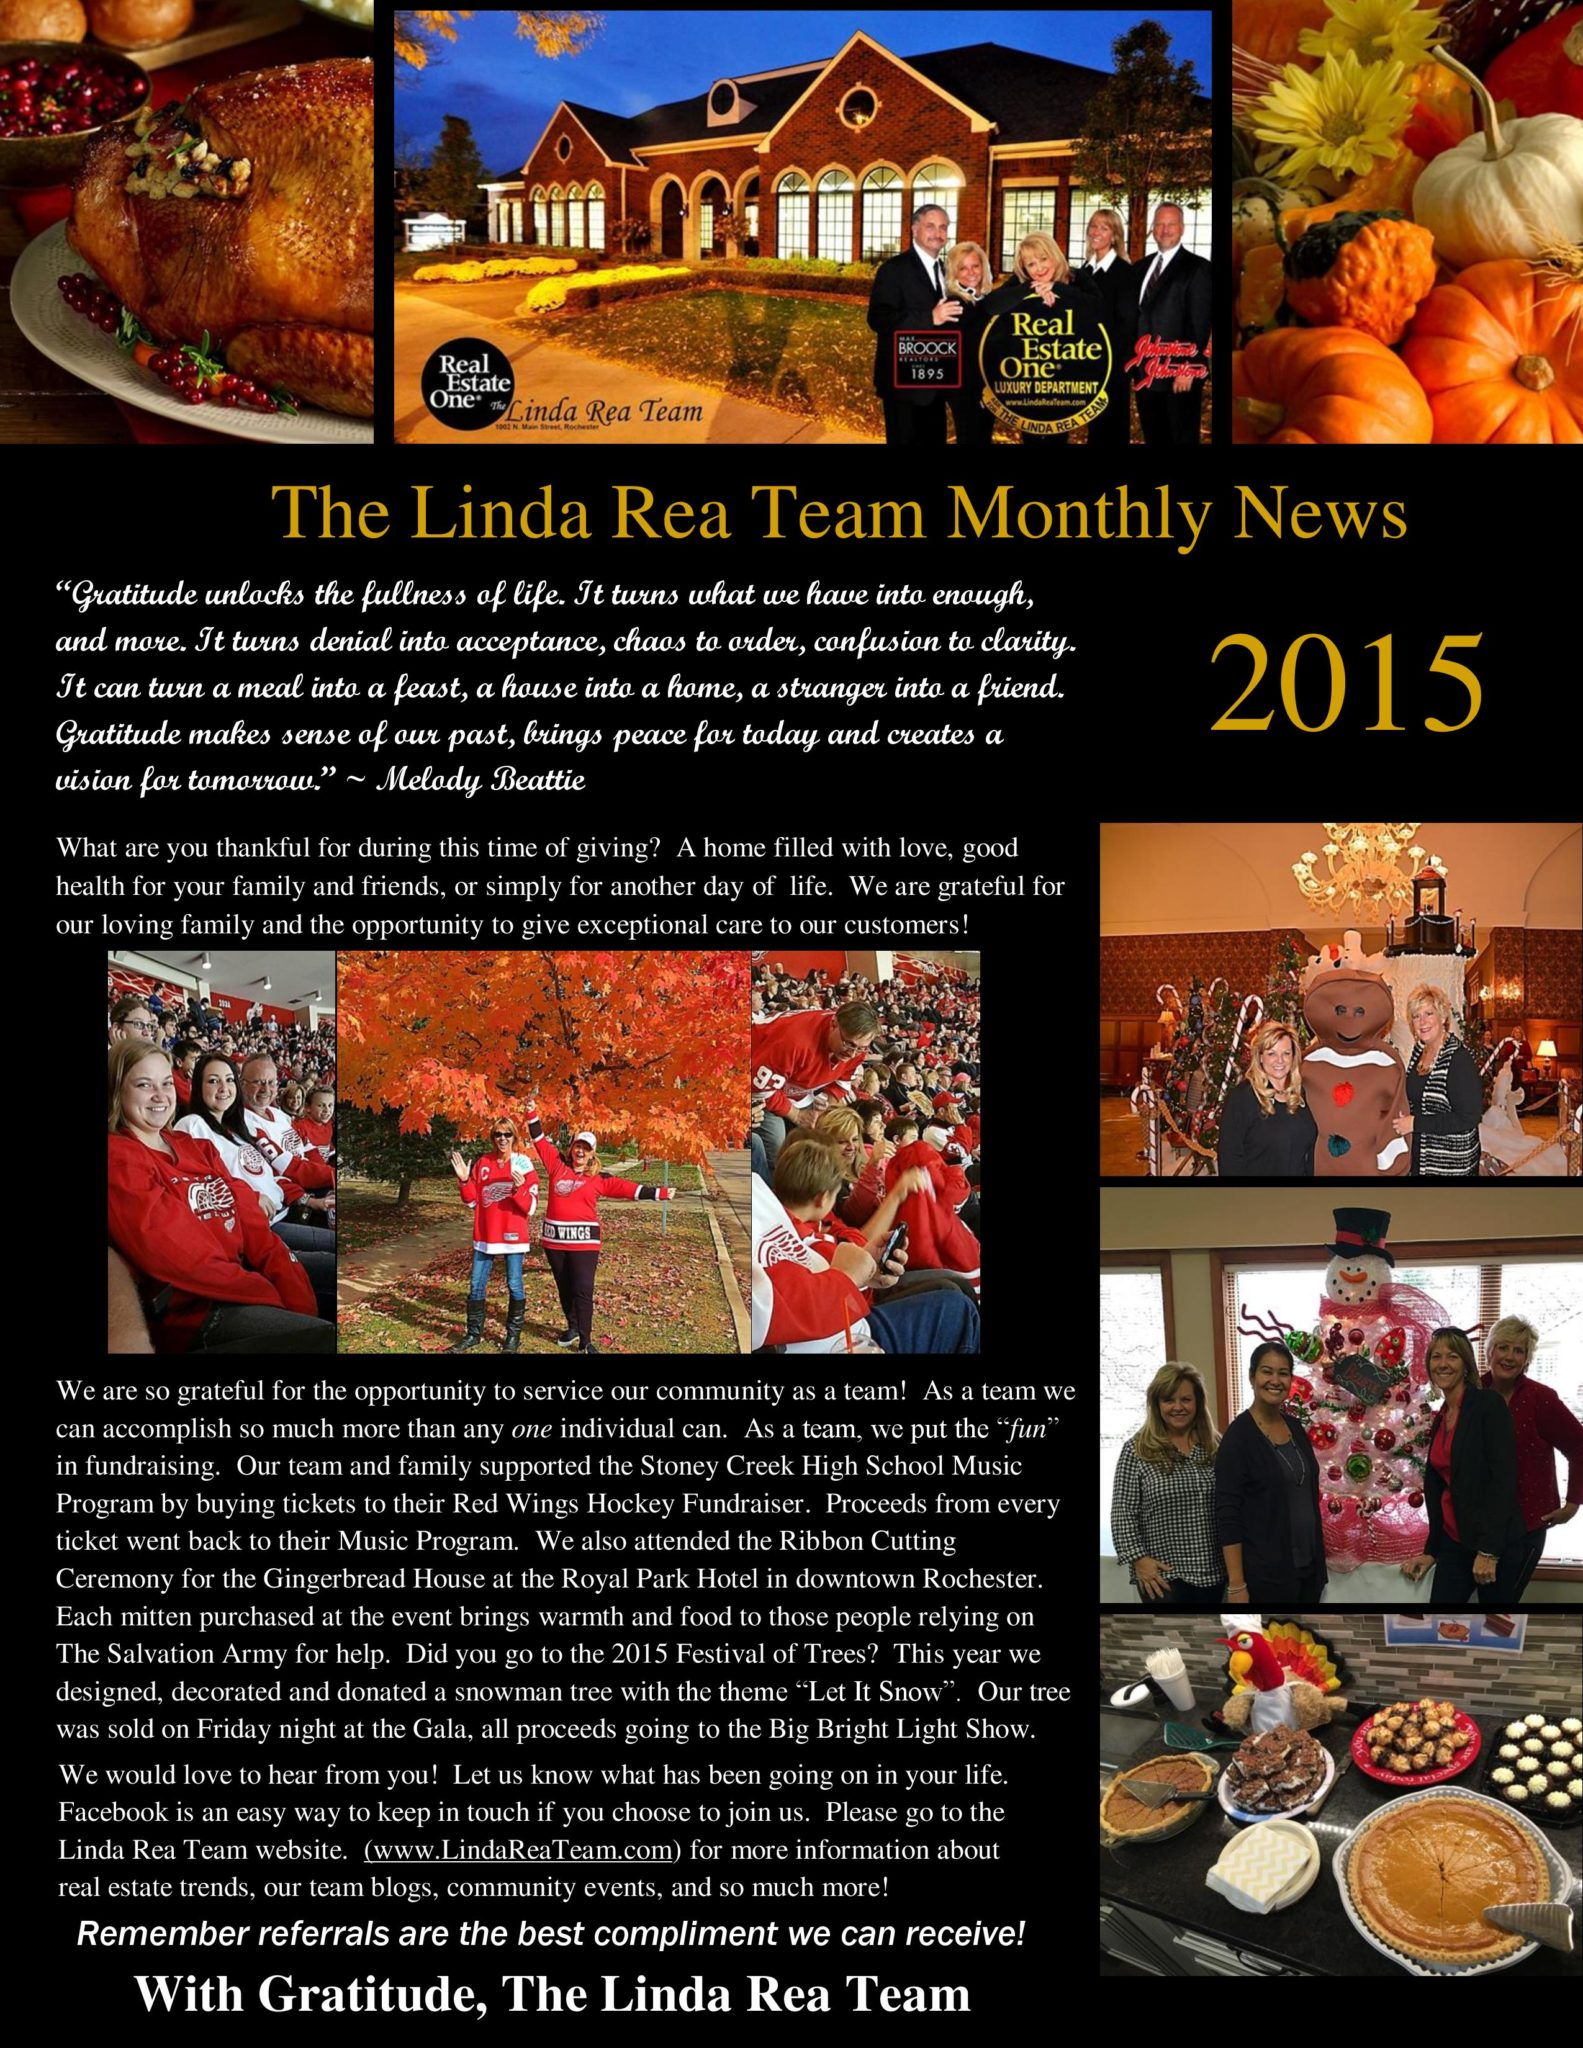 The-Linda-Rea-Team-Monthly-News-November-2015-page-001.jpg